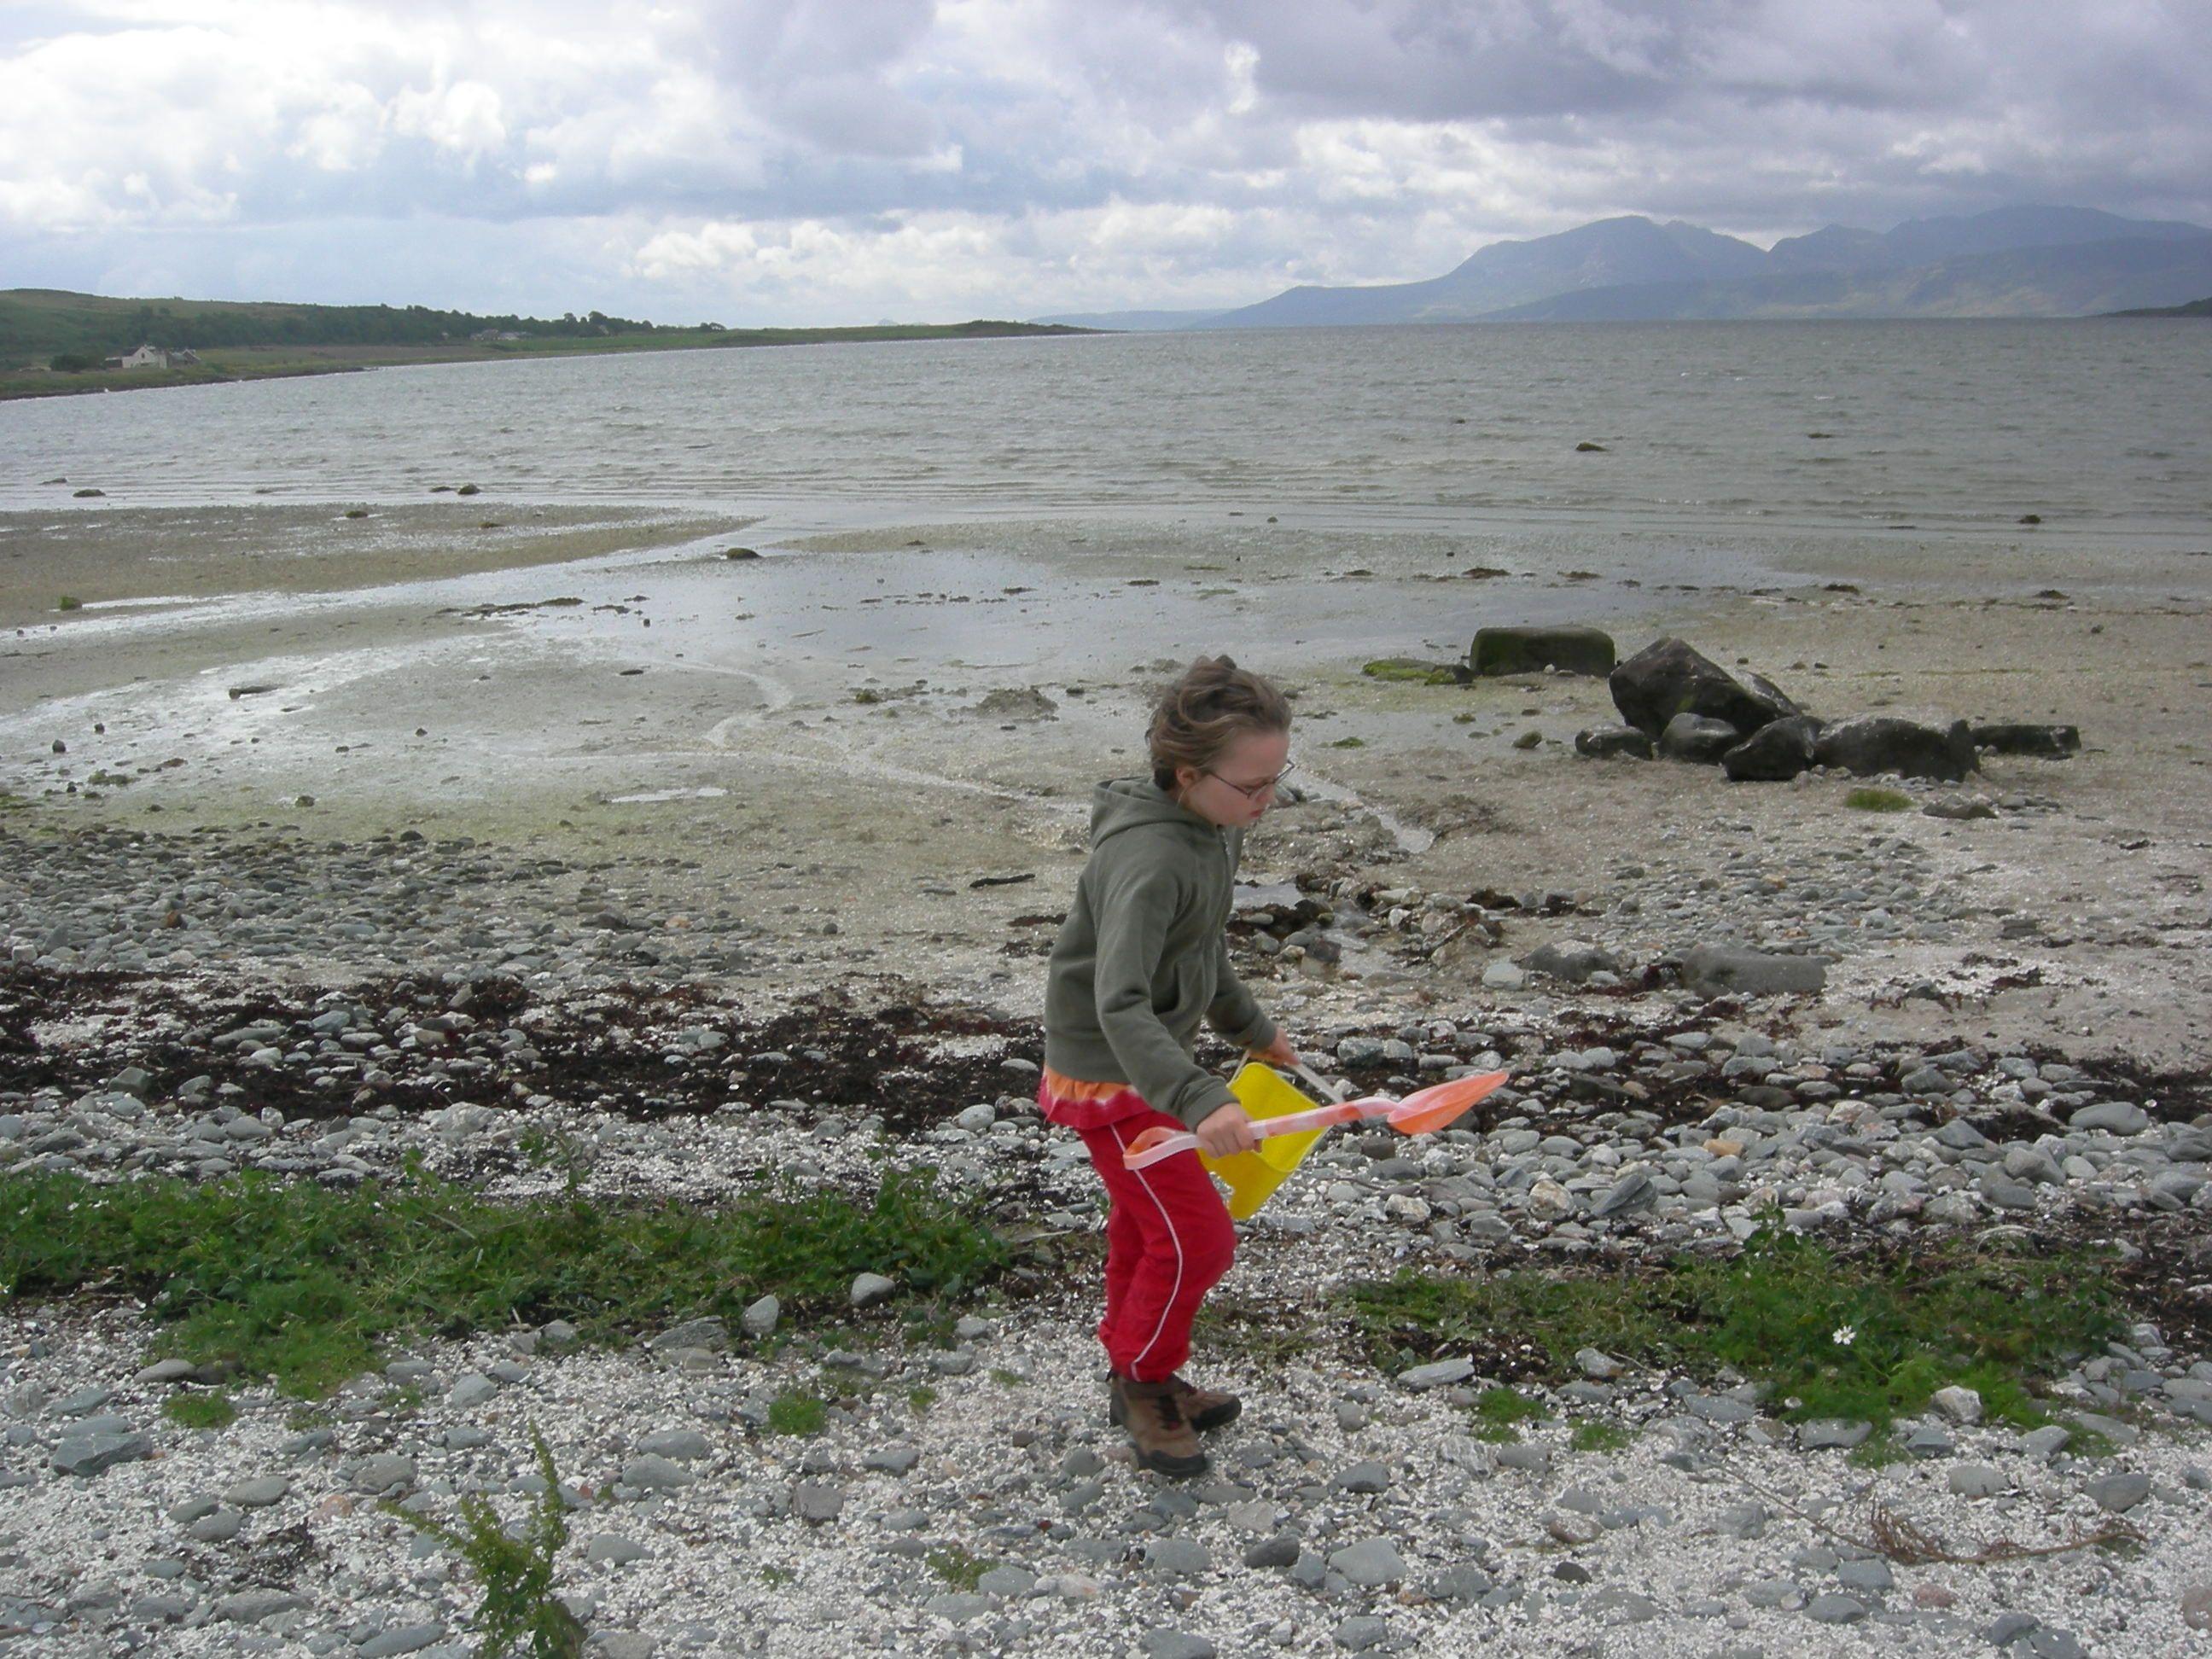 beach comber Isle of Bute 2012